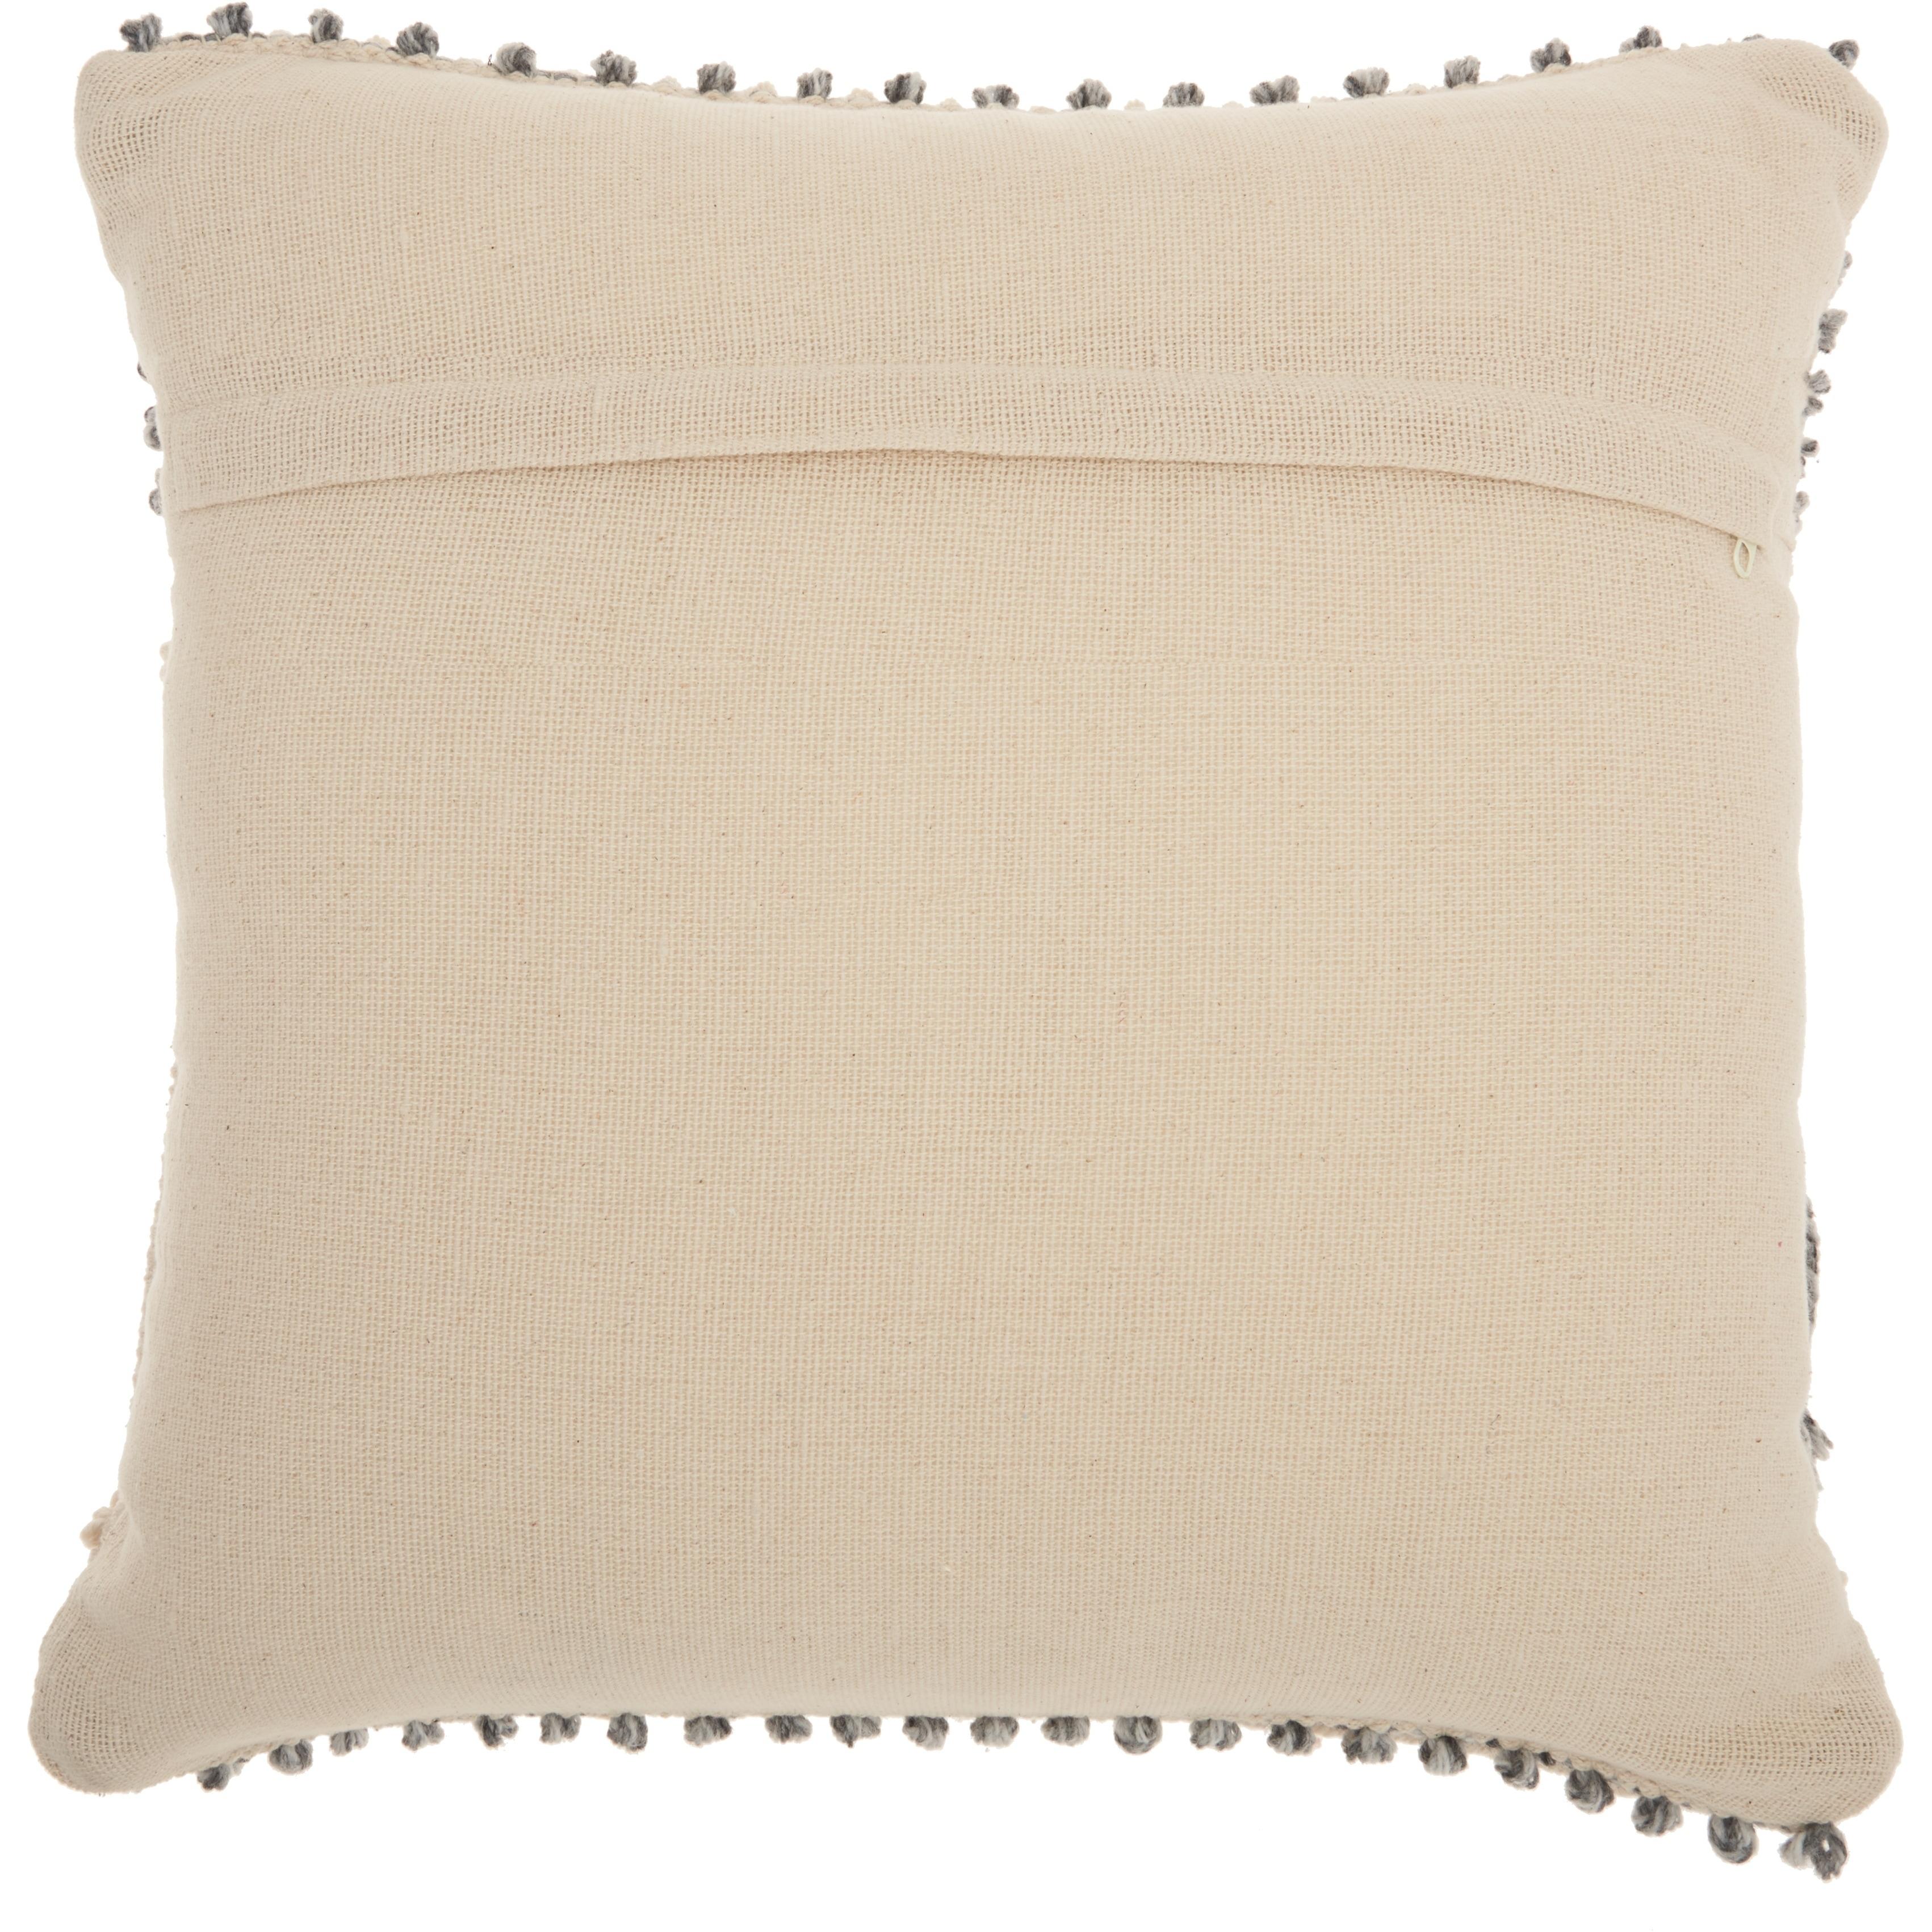 Mina Victory Handmade Ocean Blue Bohemian Throw Pillow 20 Inch X 20 Inch On Sale Overstock 24032938